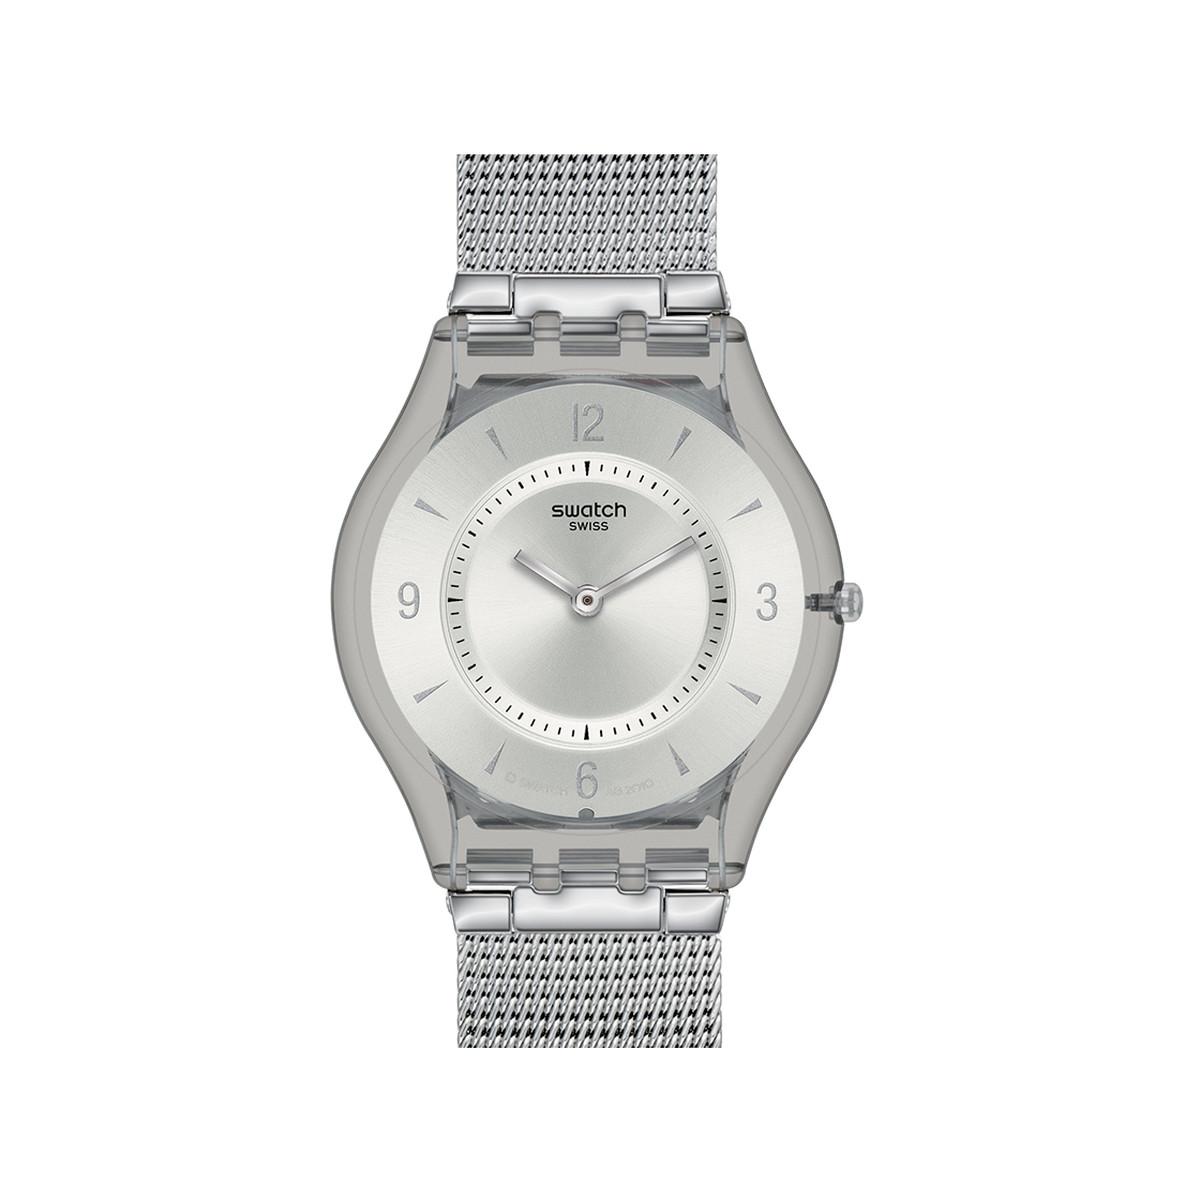 montre swatch swiss